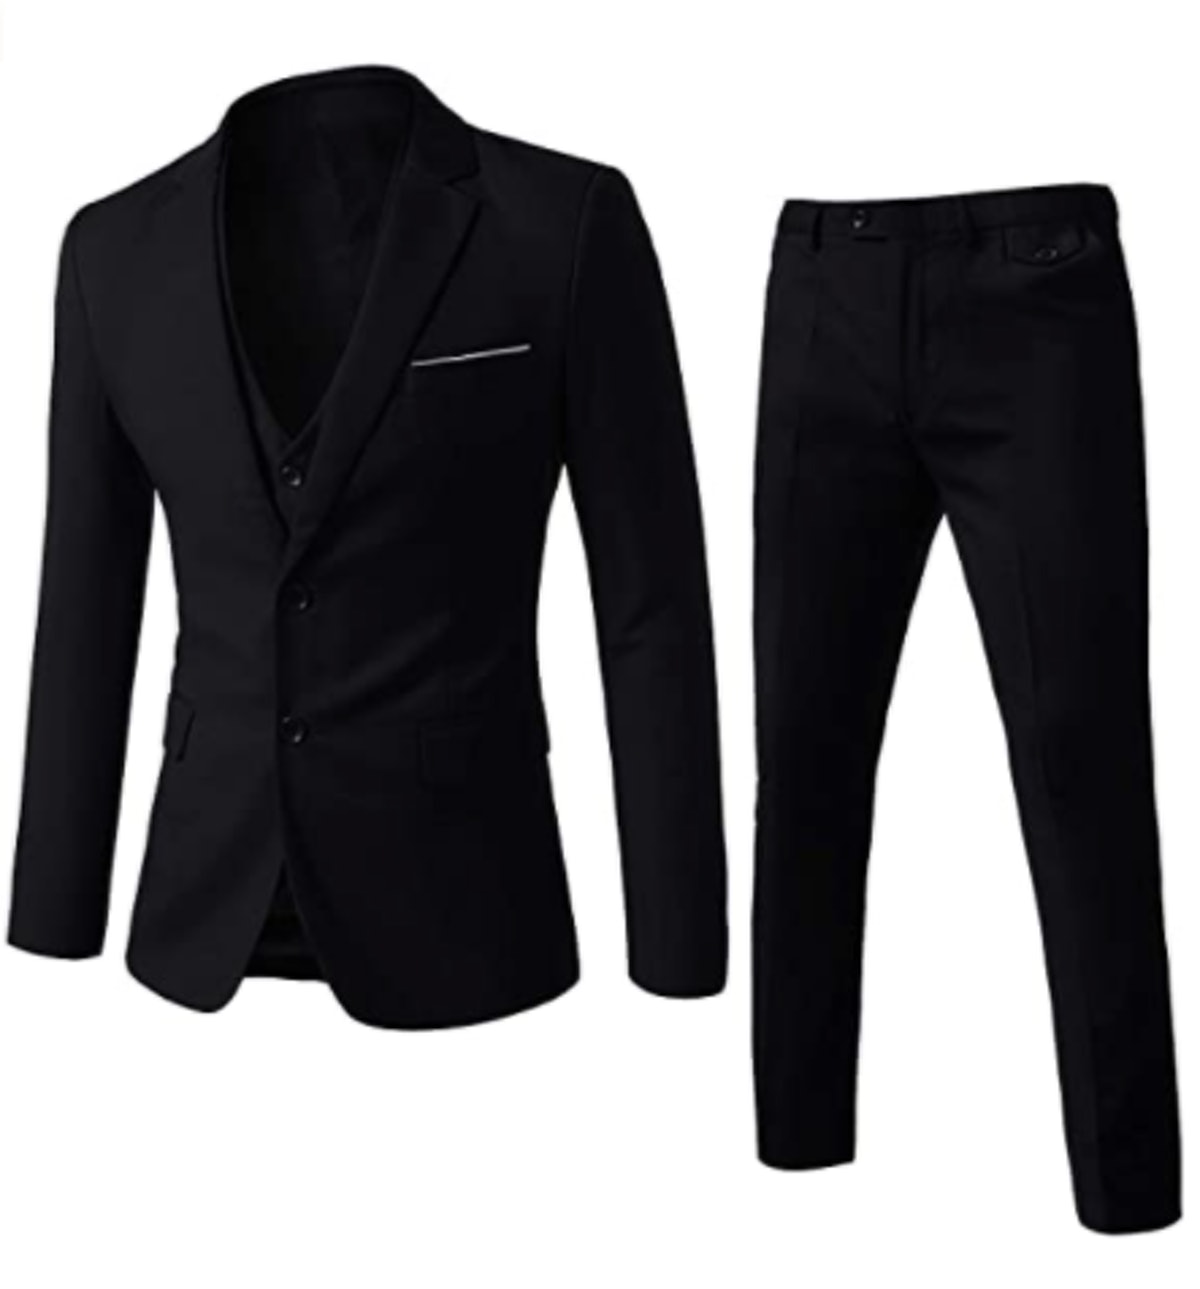 Ween Charm Black Suit